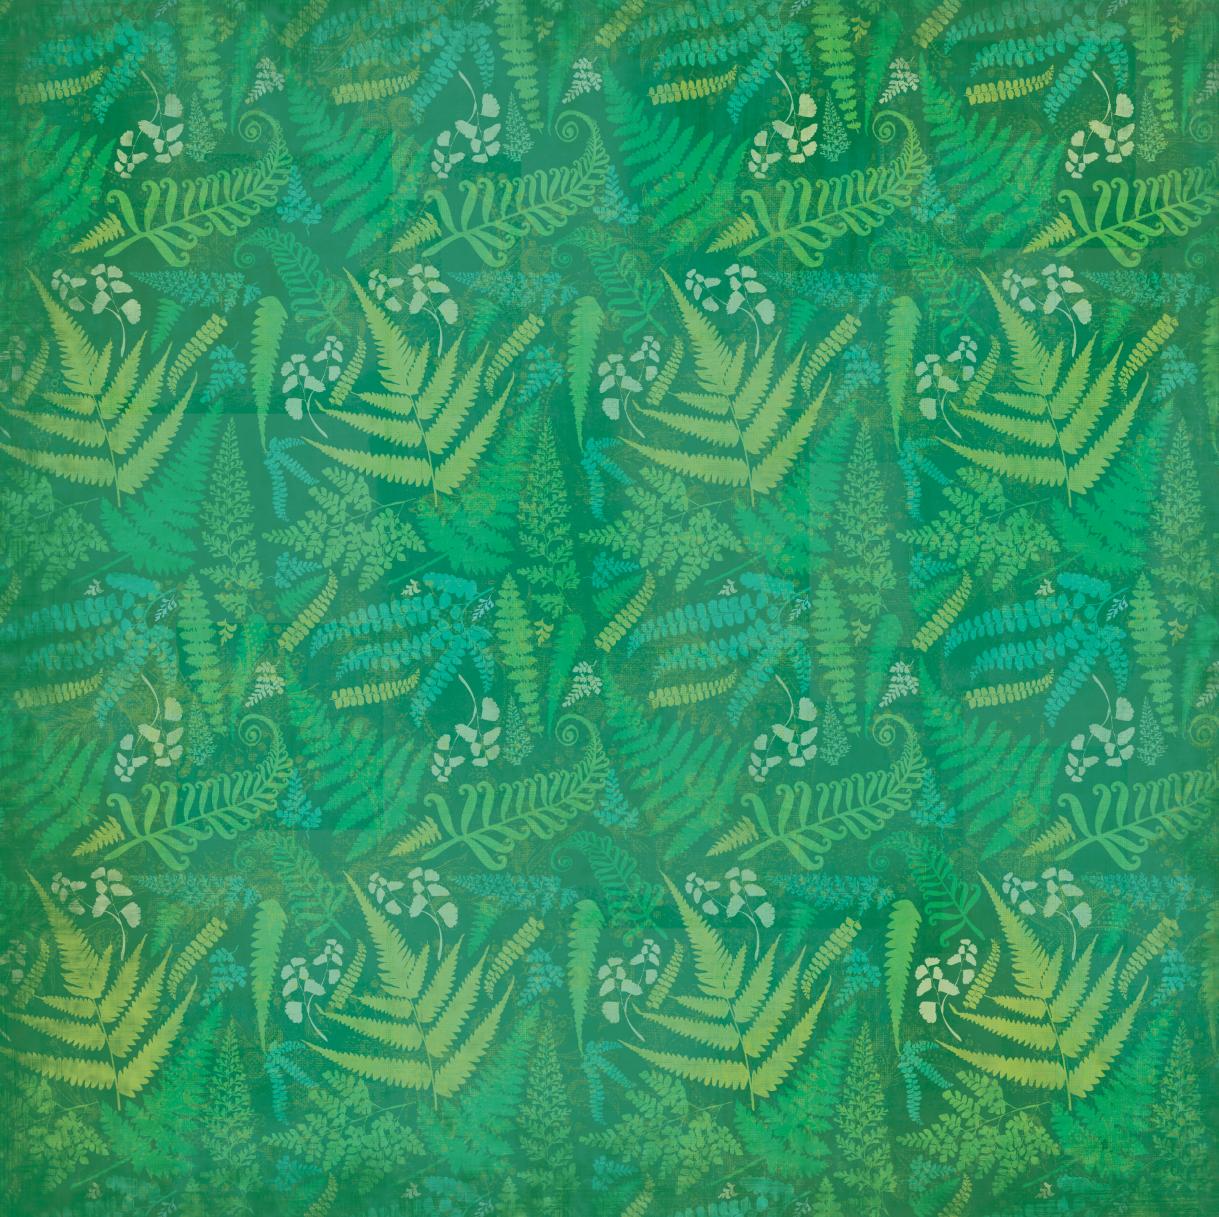 custom design surface pattern ferns inspiration nonna design illustration.png